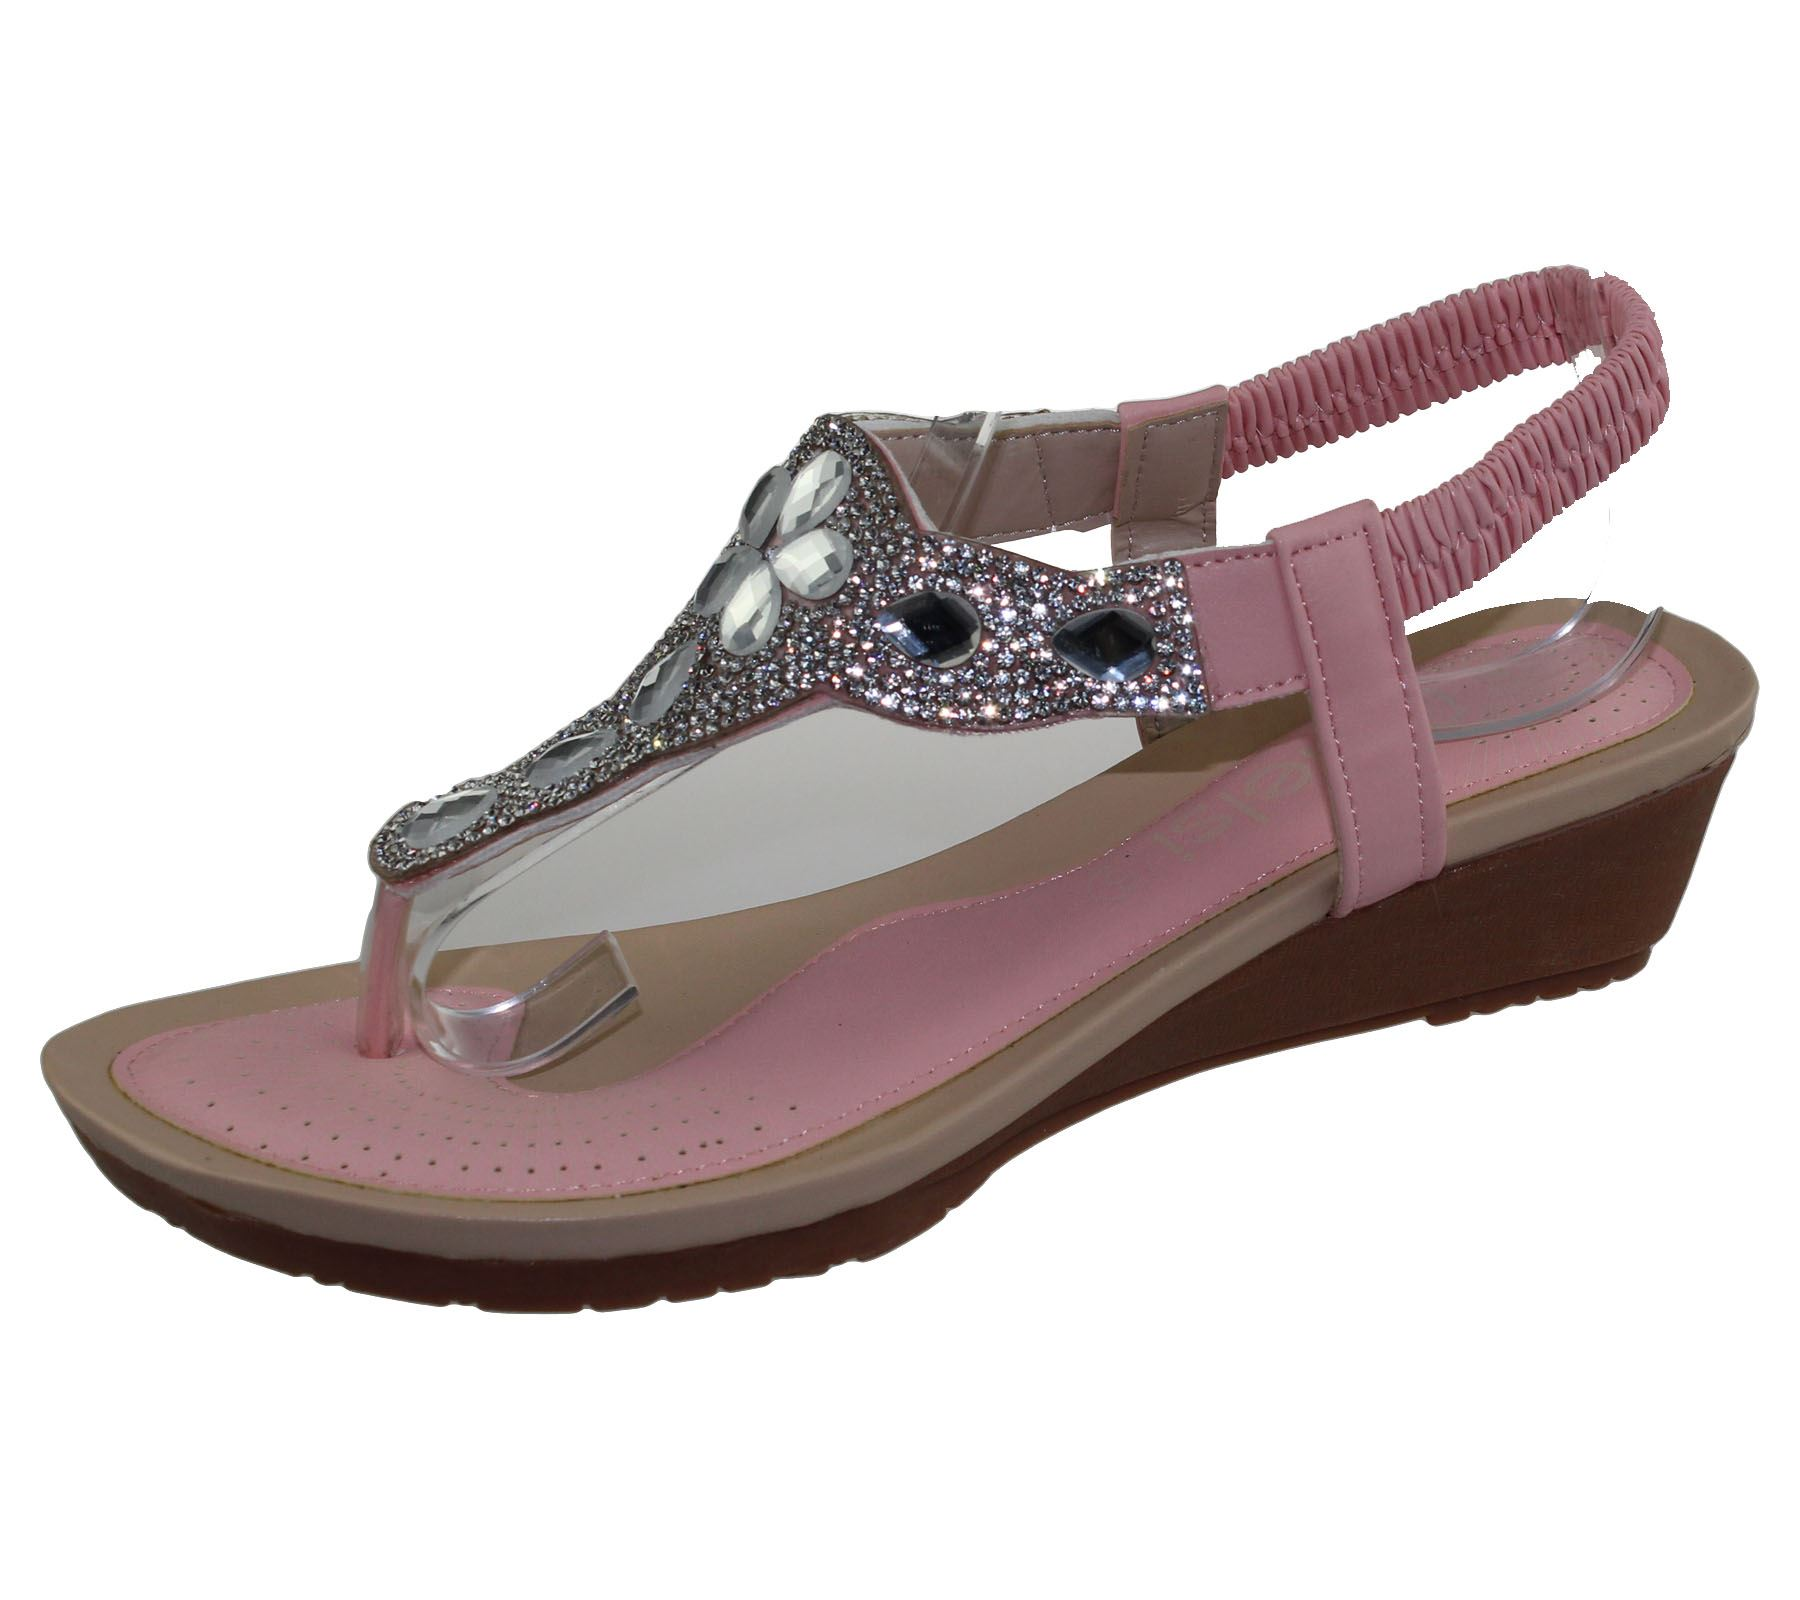 Womens sandals ebay - Womens Wedge Heel Sandals Ladies Diamante Toe Post